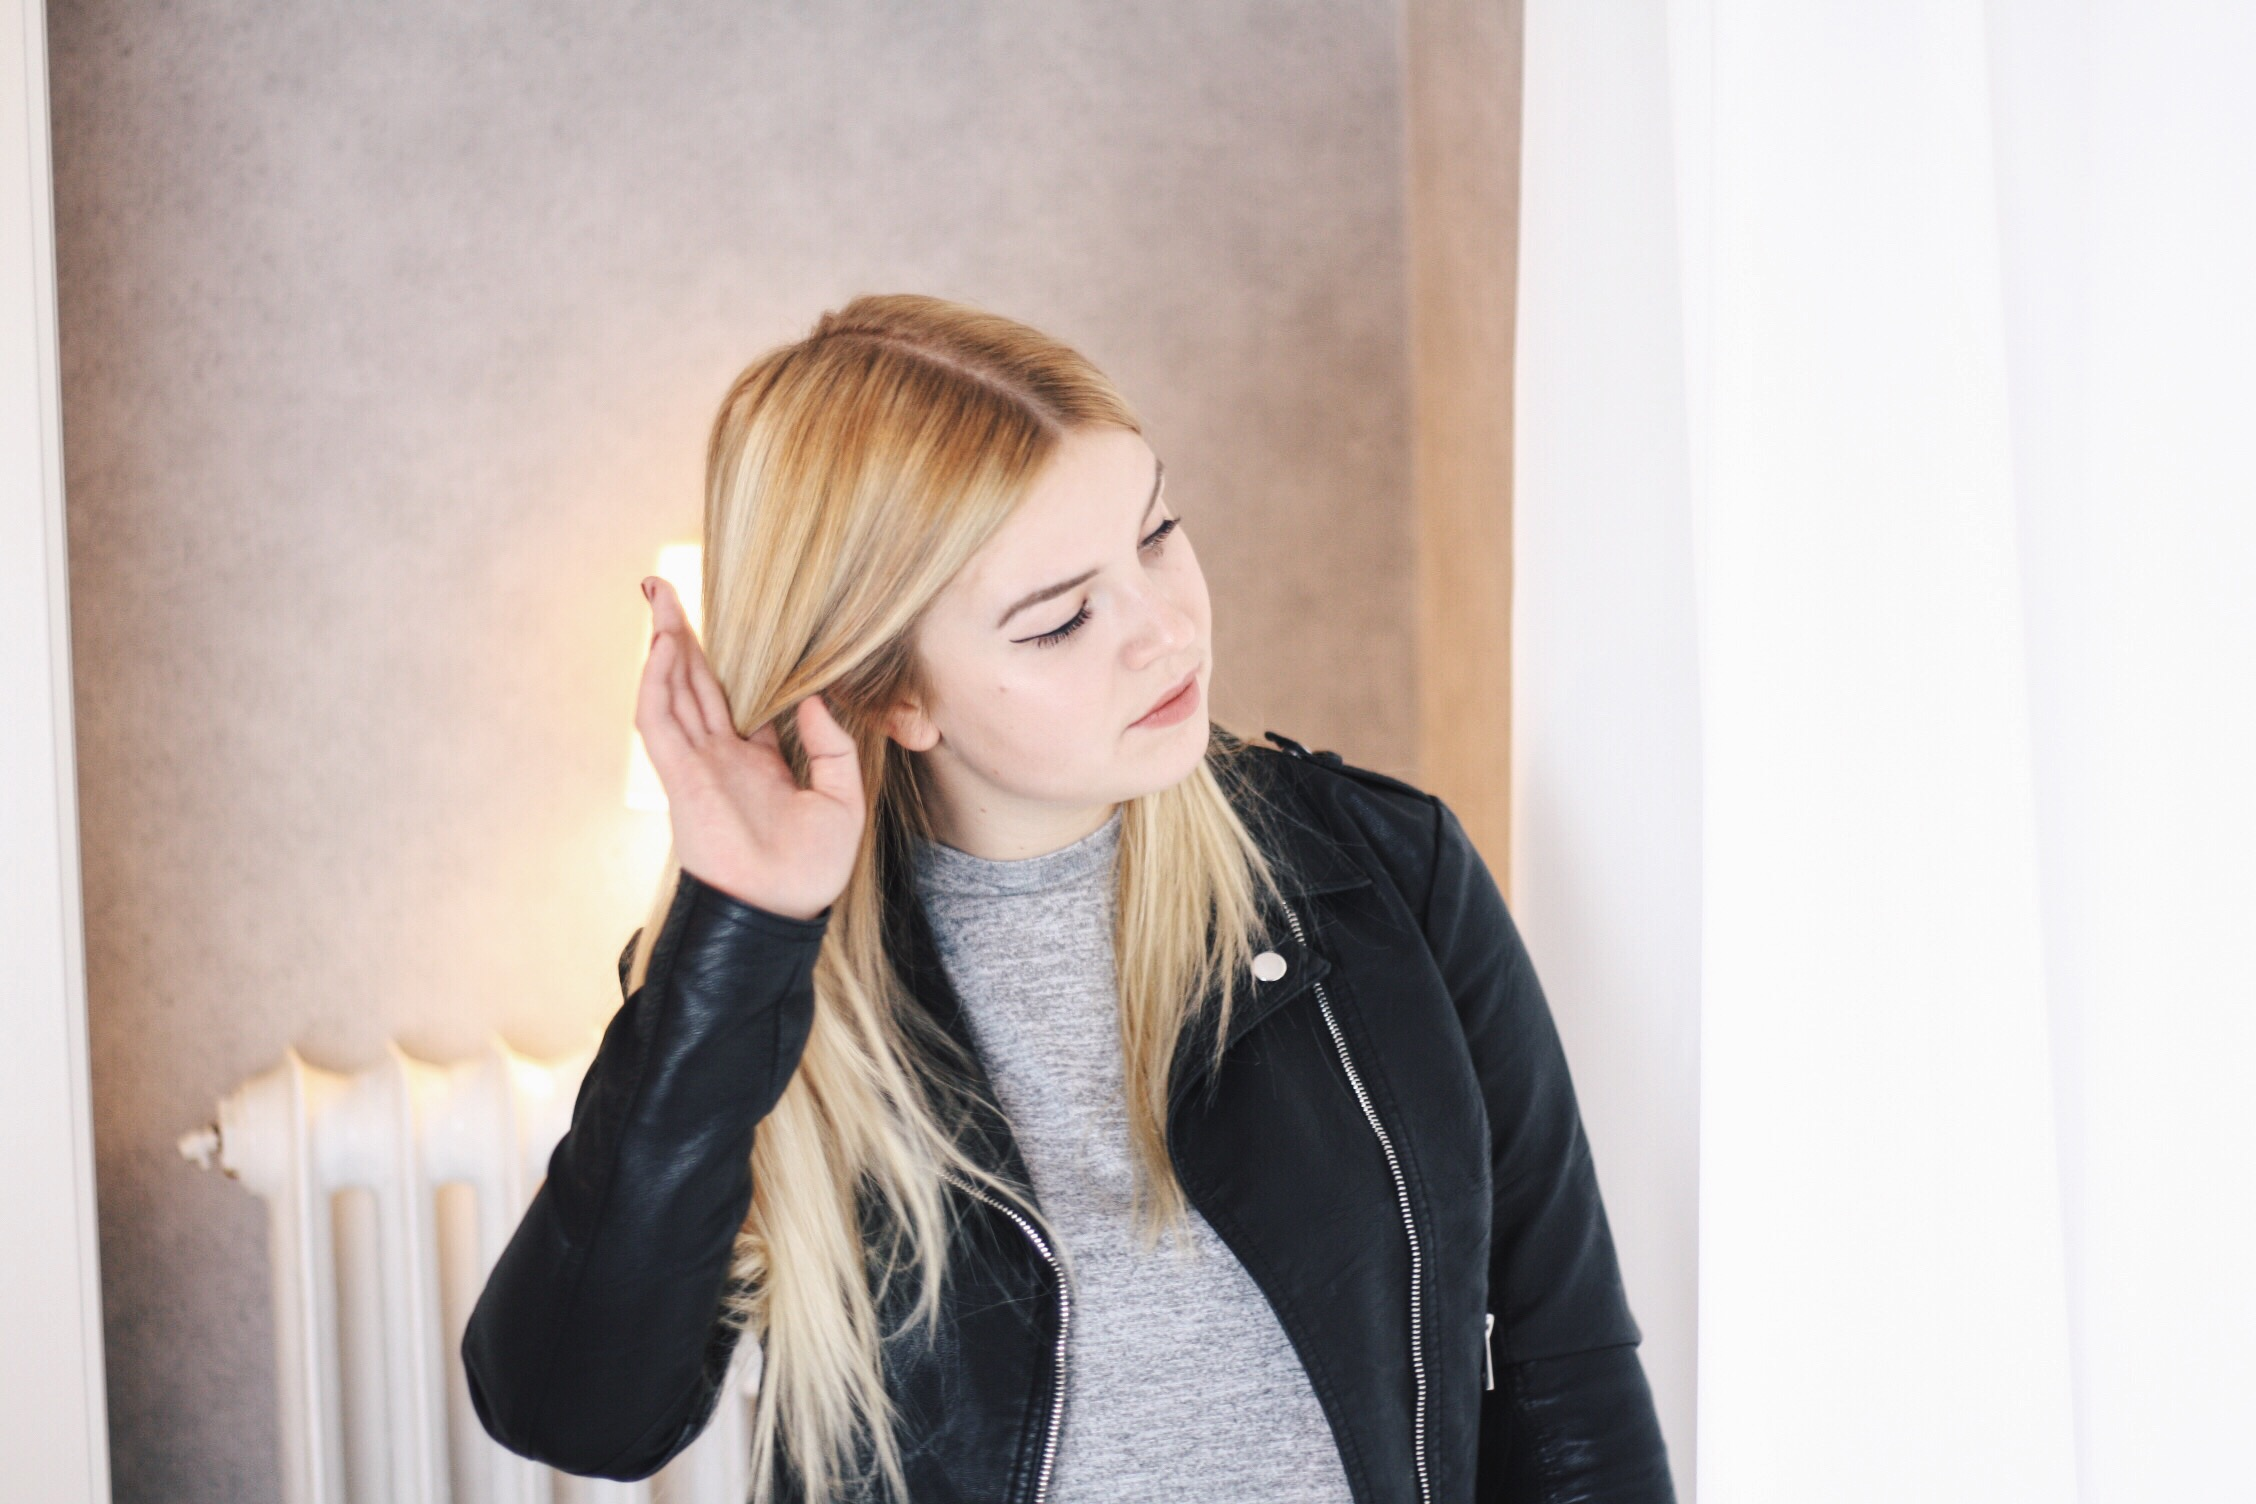 itsgoldie_blogger_haare_blond_fashionblogger_modeblogger_hannover_hamburg